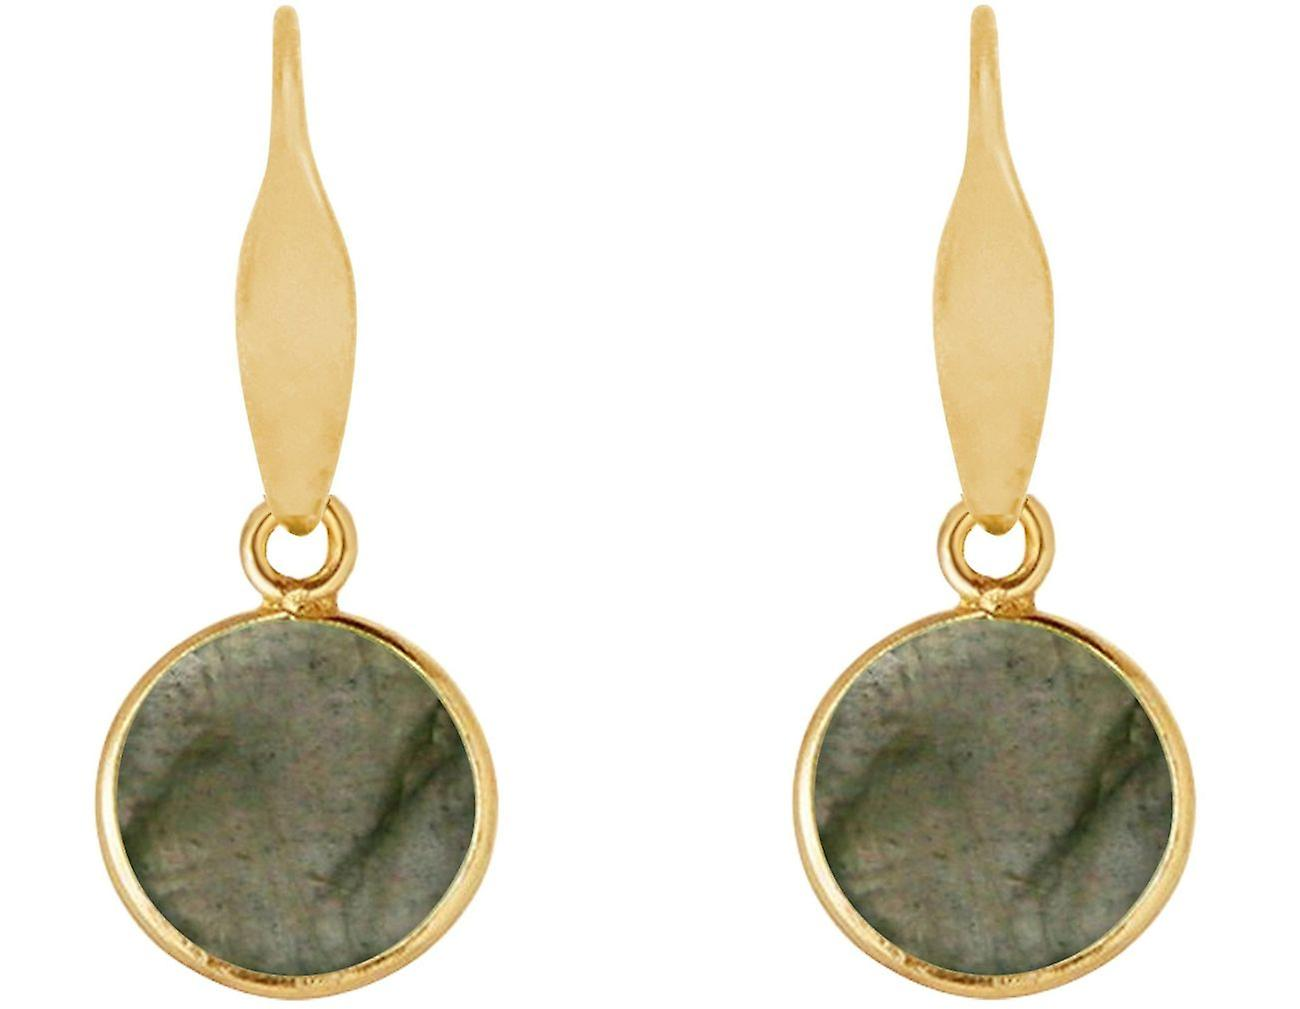 Gemshine Ohrringe Labradorit Edelstein Tropfen 925 Silber, vergoldet oder rose